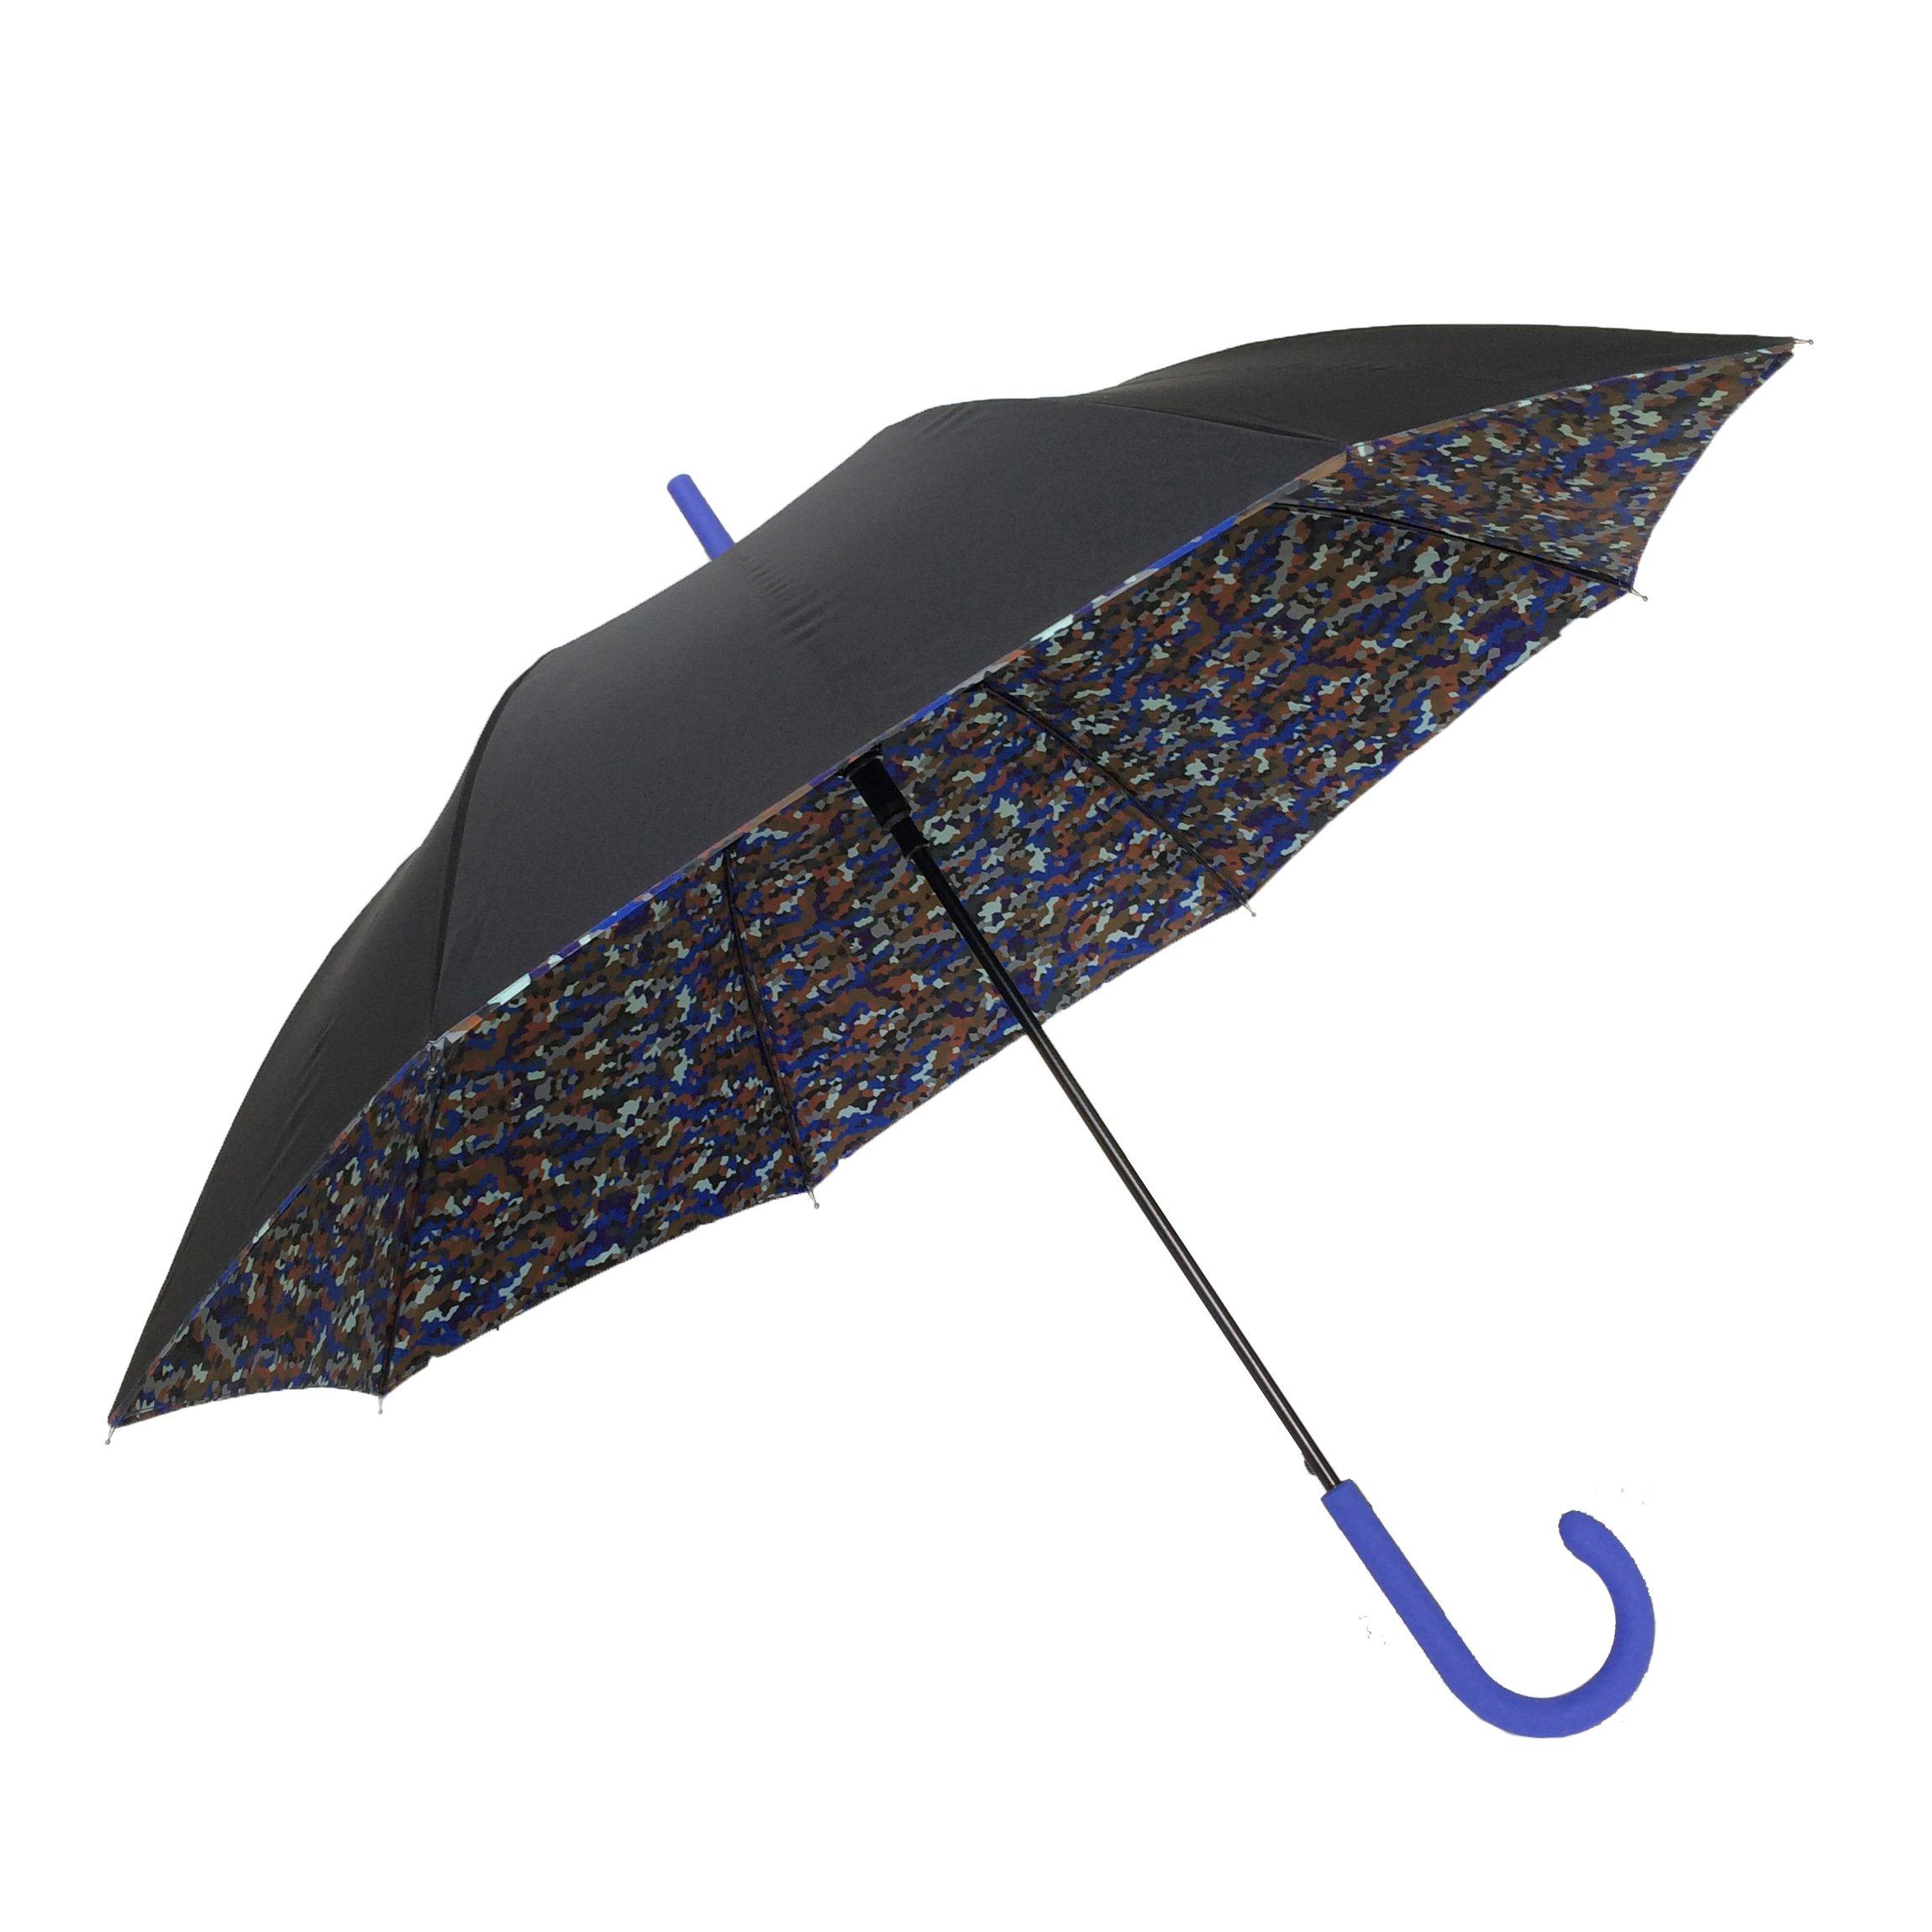 SMATI Stick Umbrella - Double Layers - French Design - Fashion - Sturdy - 8 fibreglass ribs Windproof - color (Blue Camouflage)